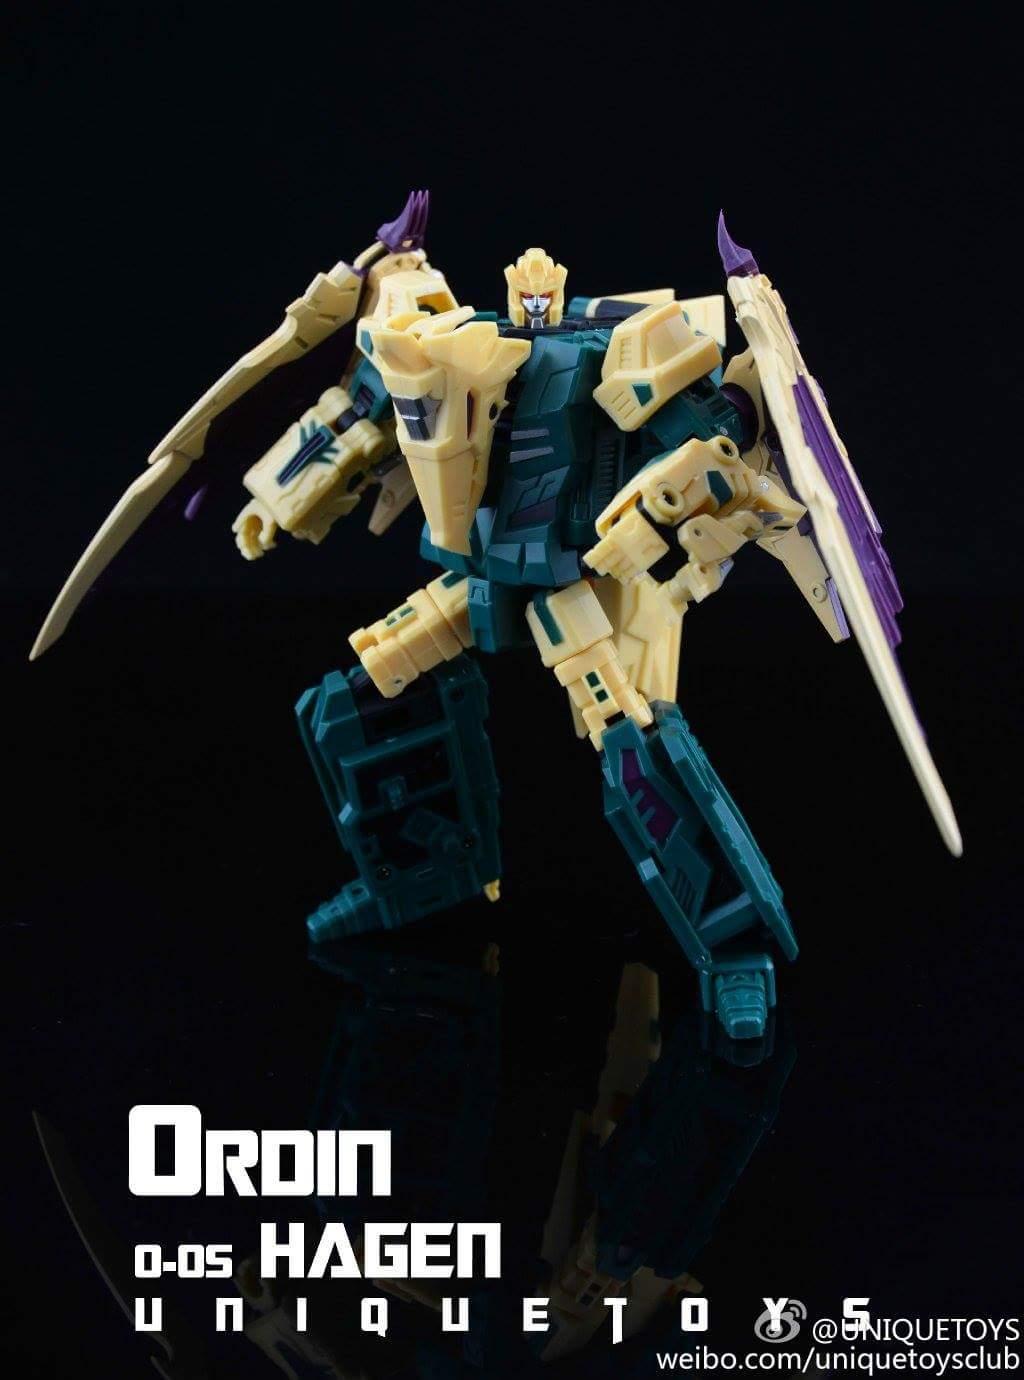 [Unique Toys] Produit Tiers - Ordin - aka Abominus Wca5ub8F